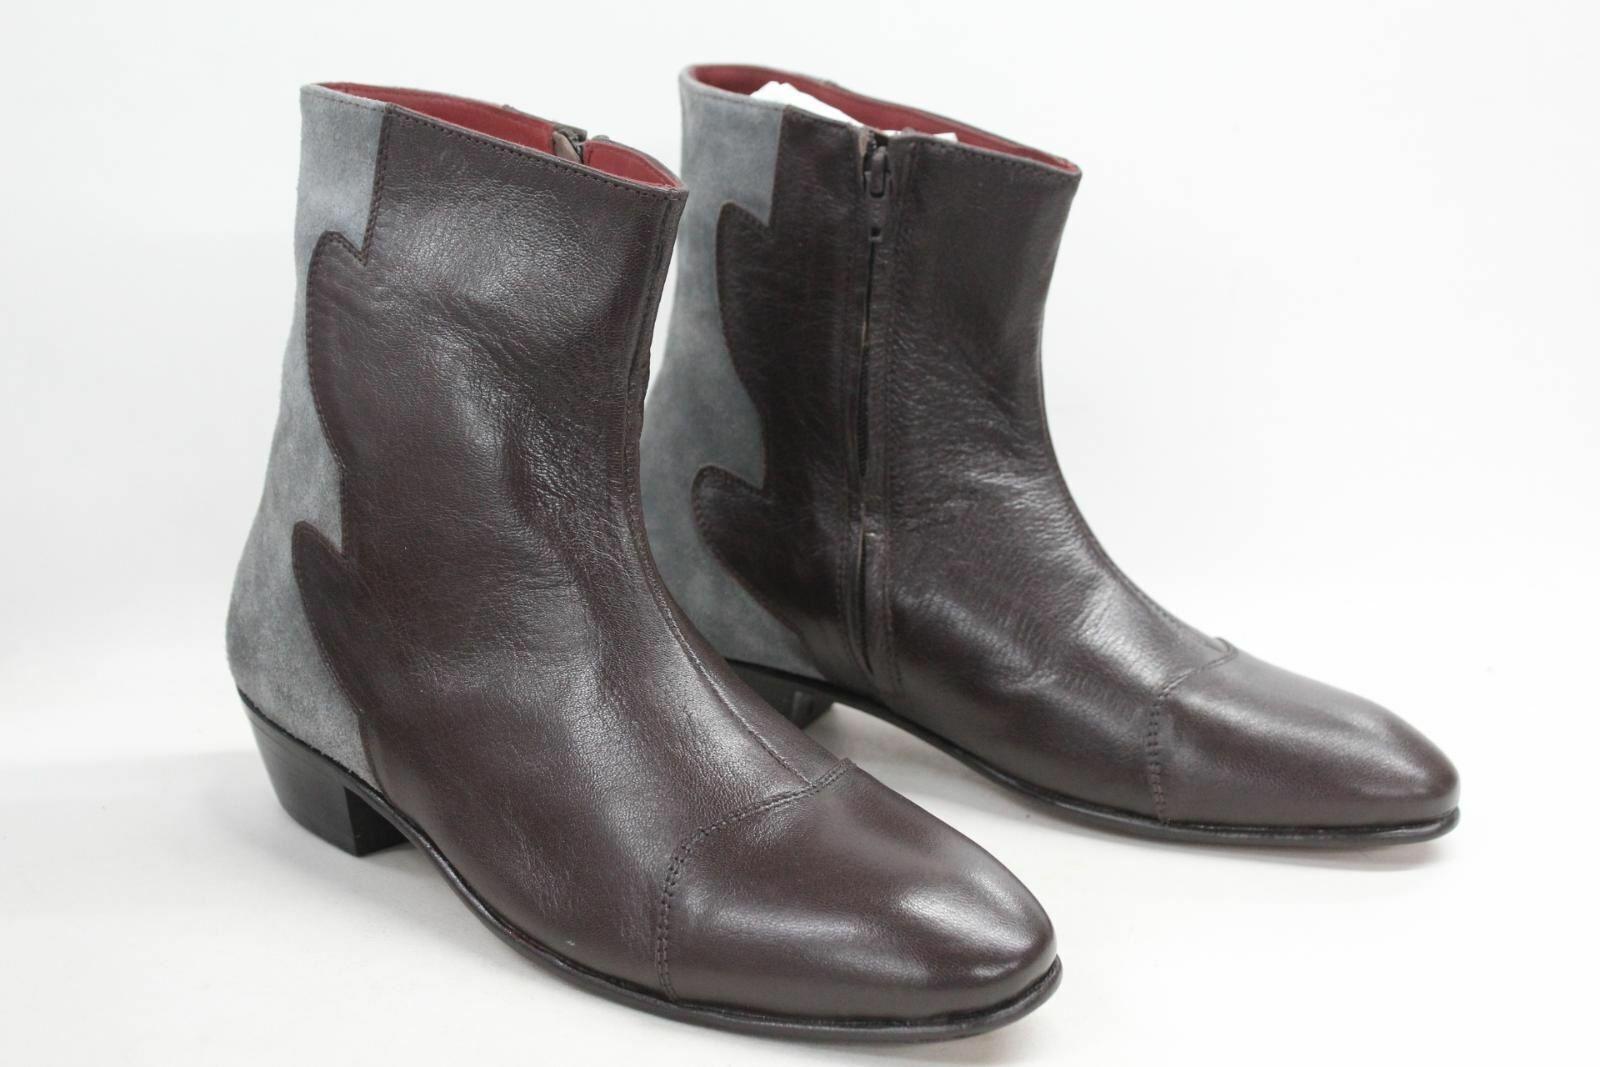 DISTINCT ADVANTAGE Men's Eccentric Brown Leather Pull On Ankle Boots UK9 BNIB